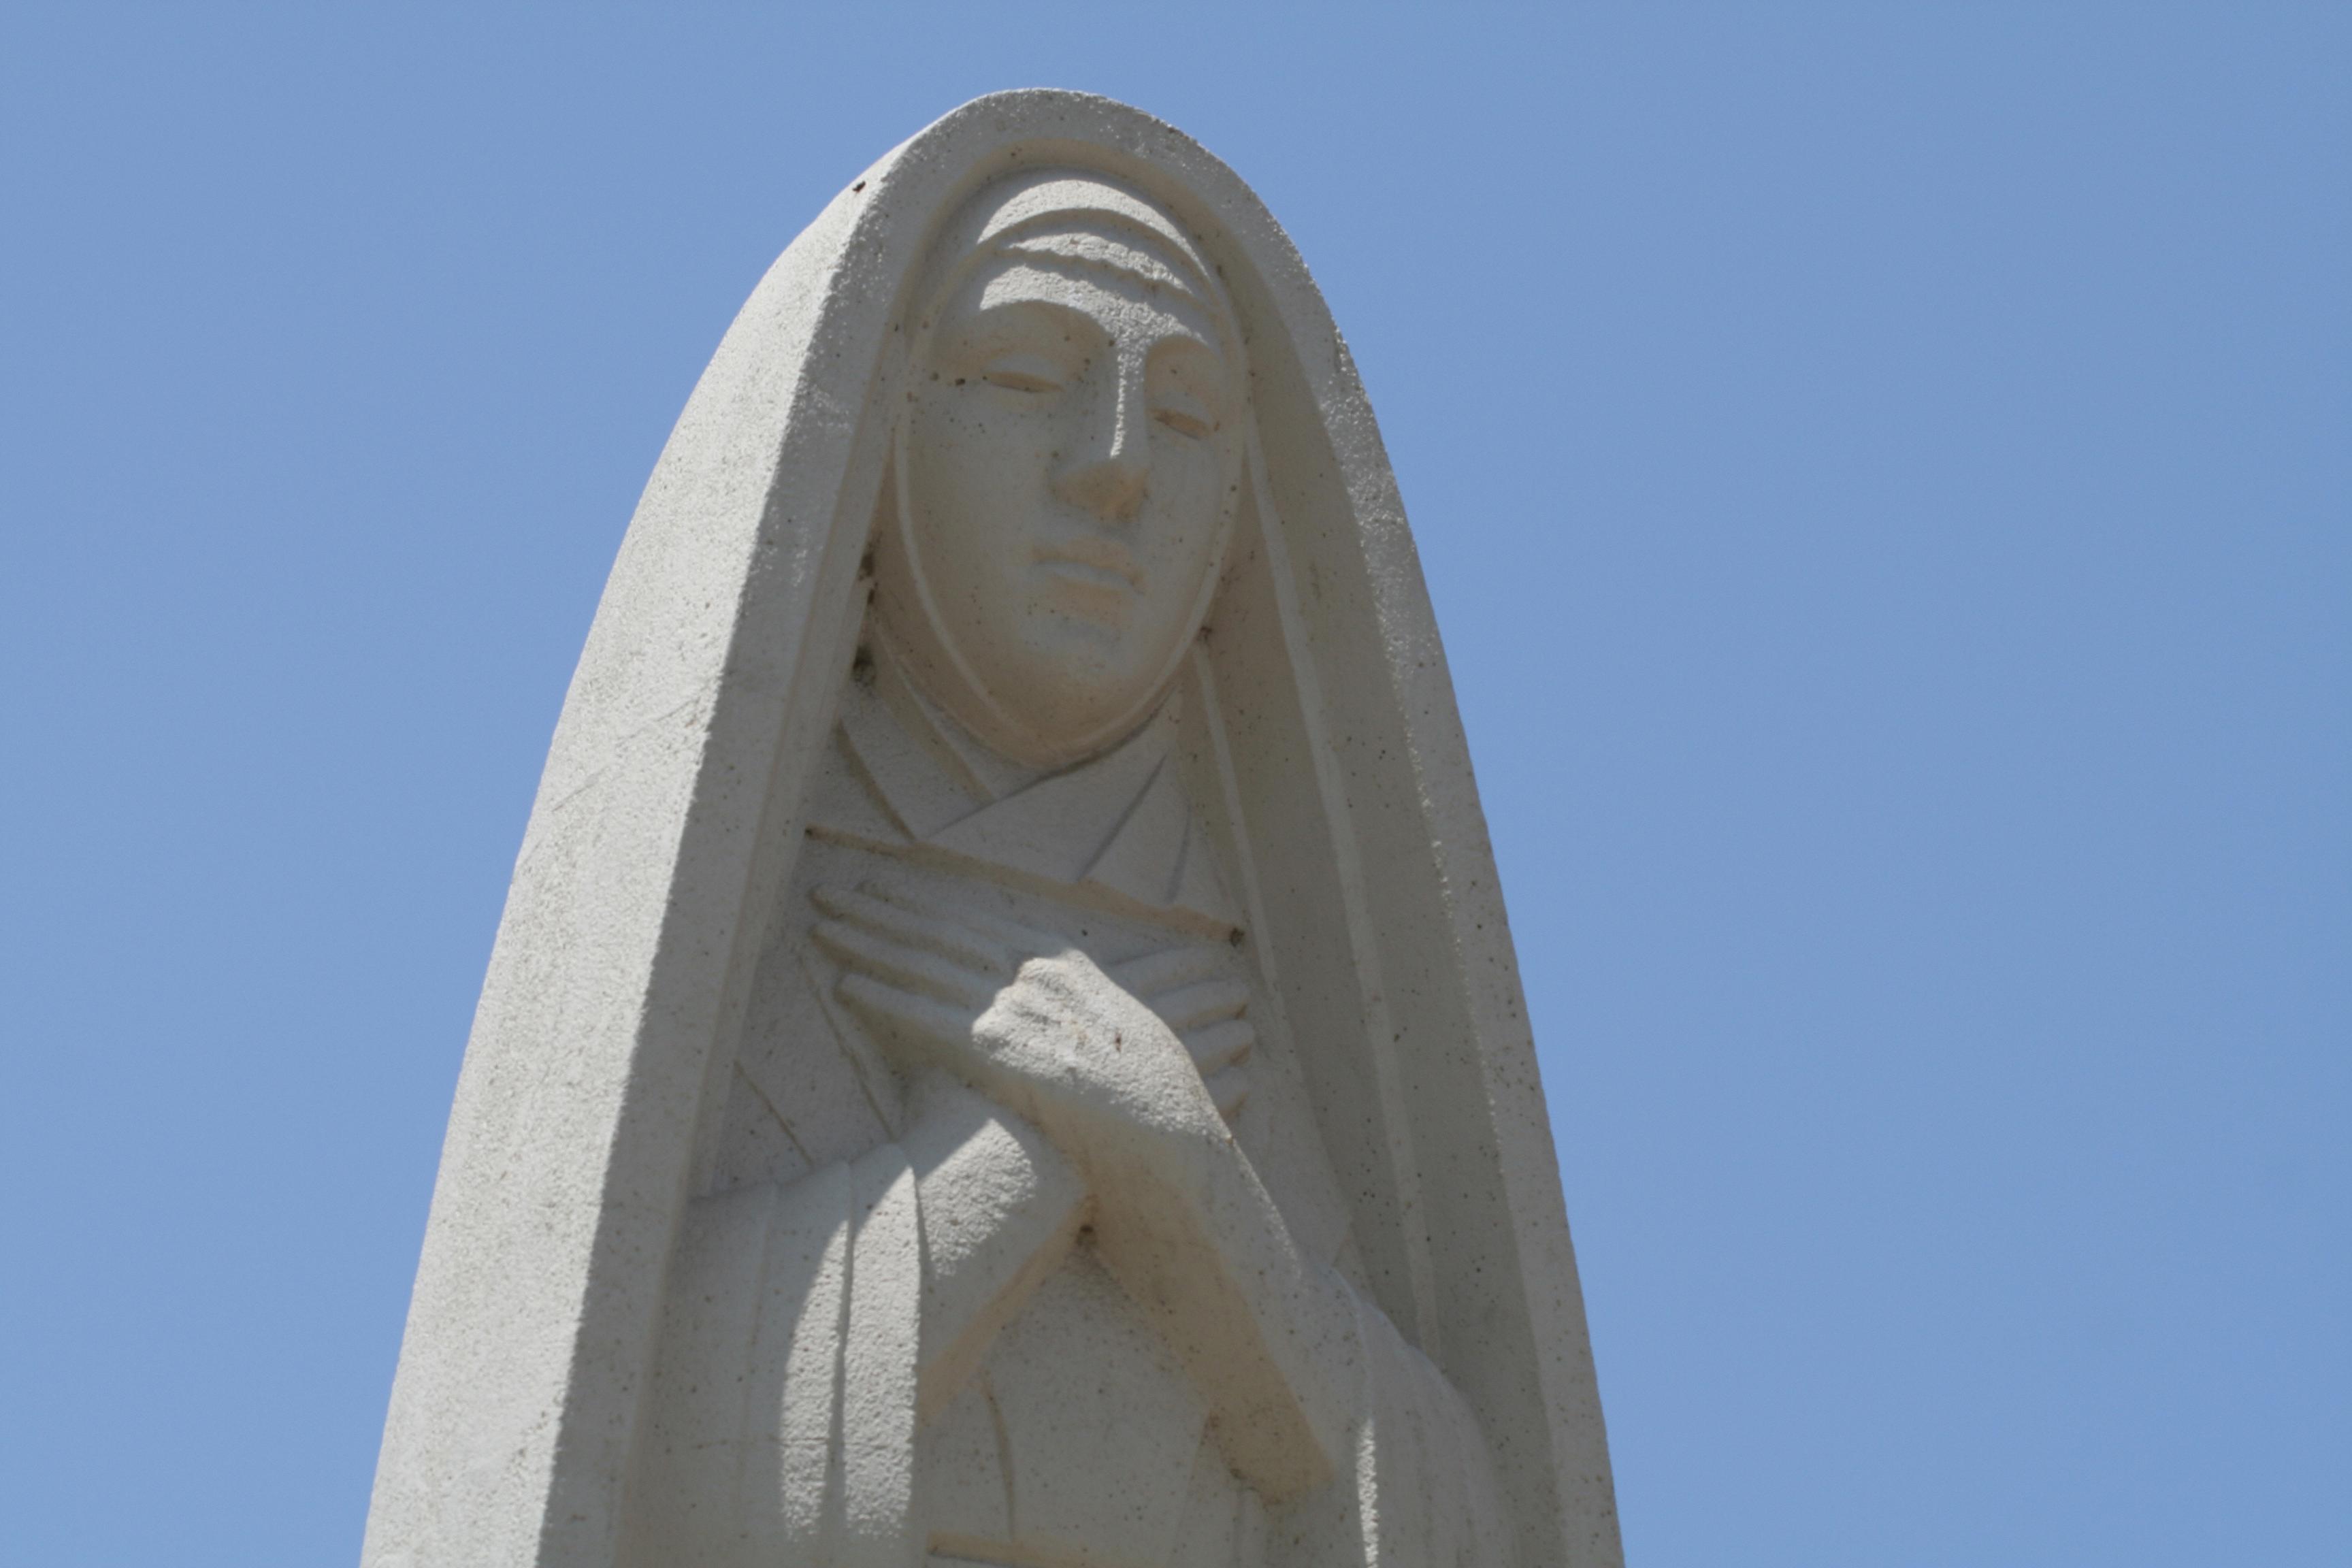 The art deco statue of Saint Monica  still stands in the city's public park